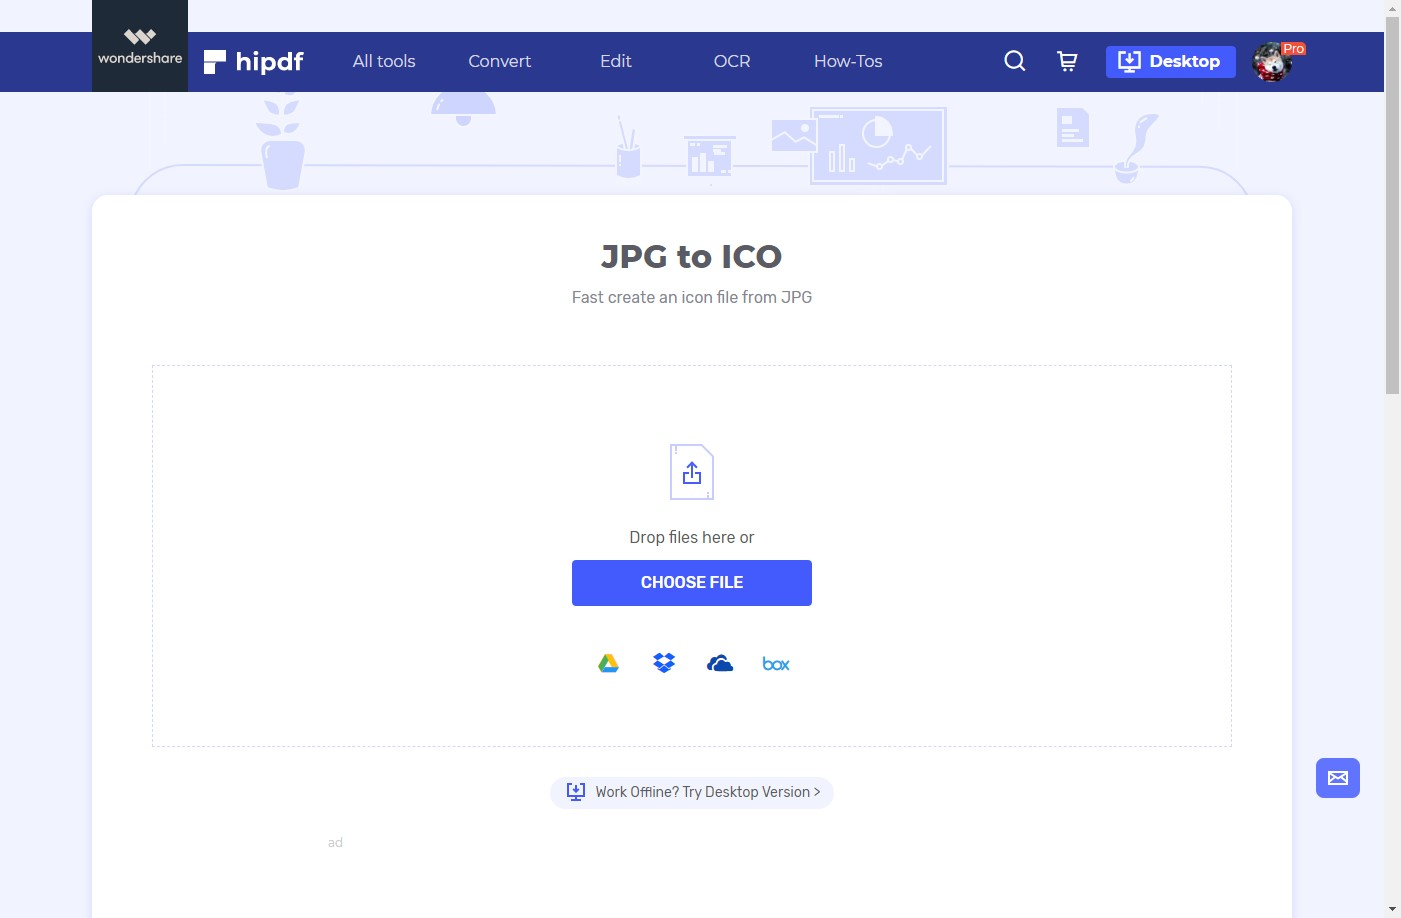 hipdf jpg to ico converter